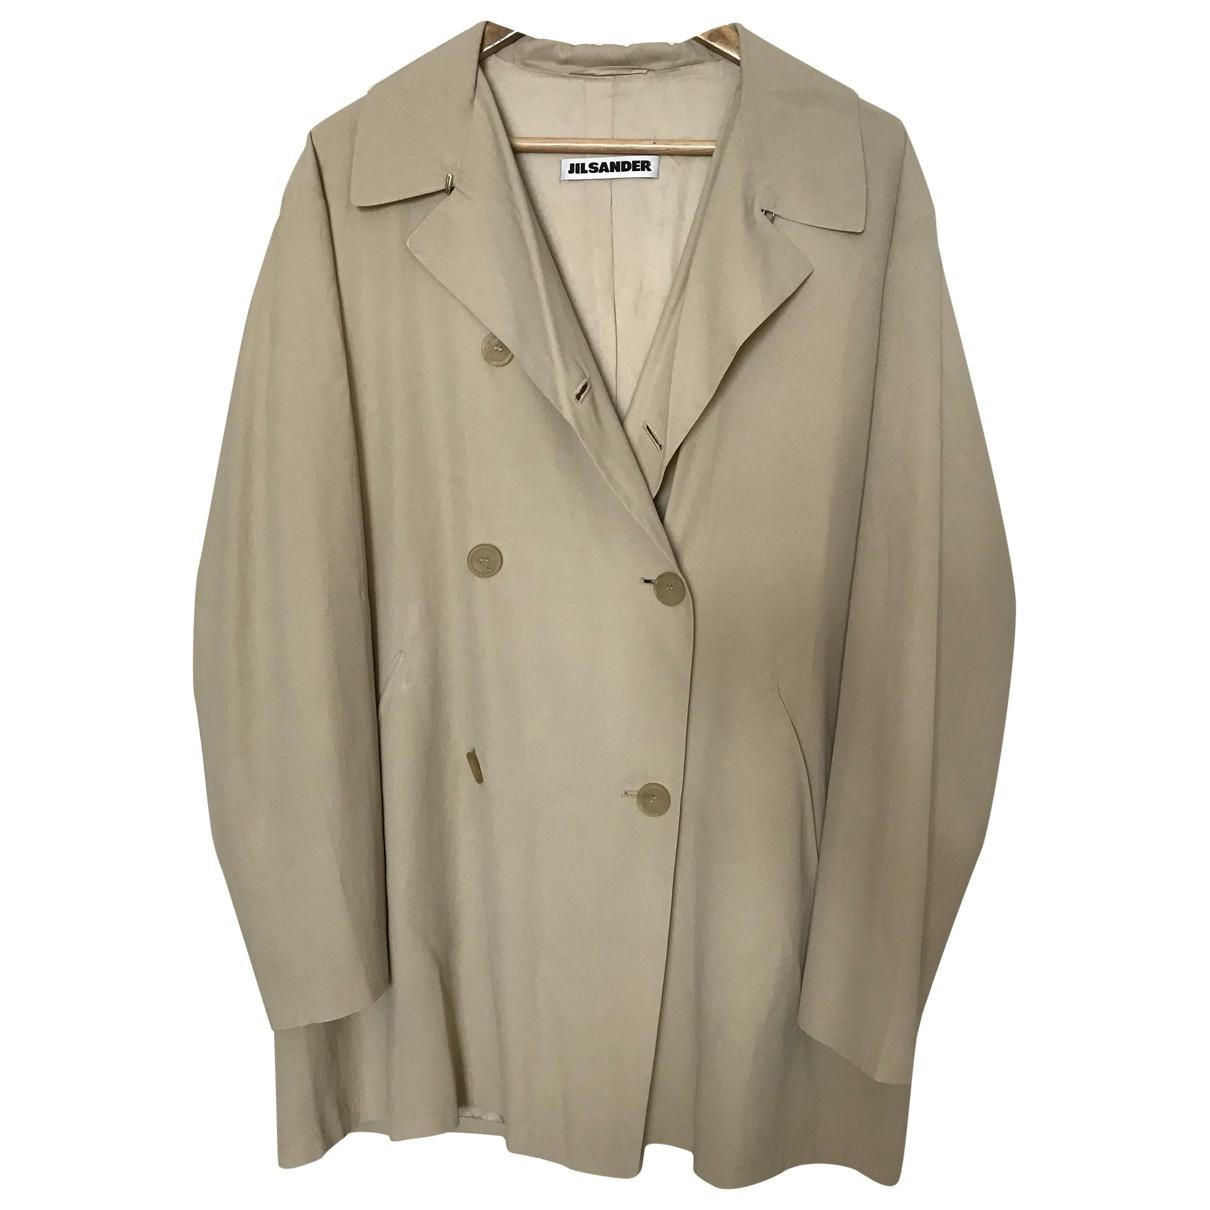 Jil Sander \N Beige coat for Women 40 FR